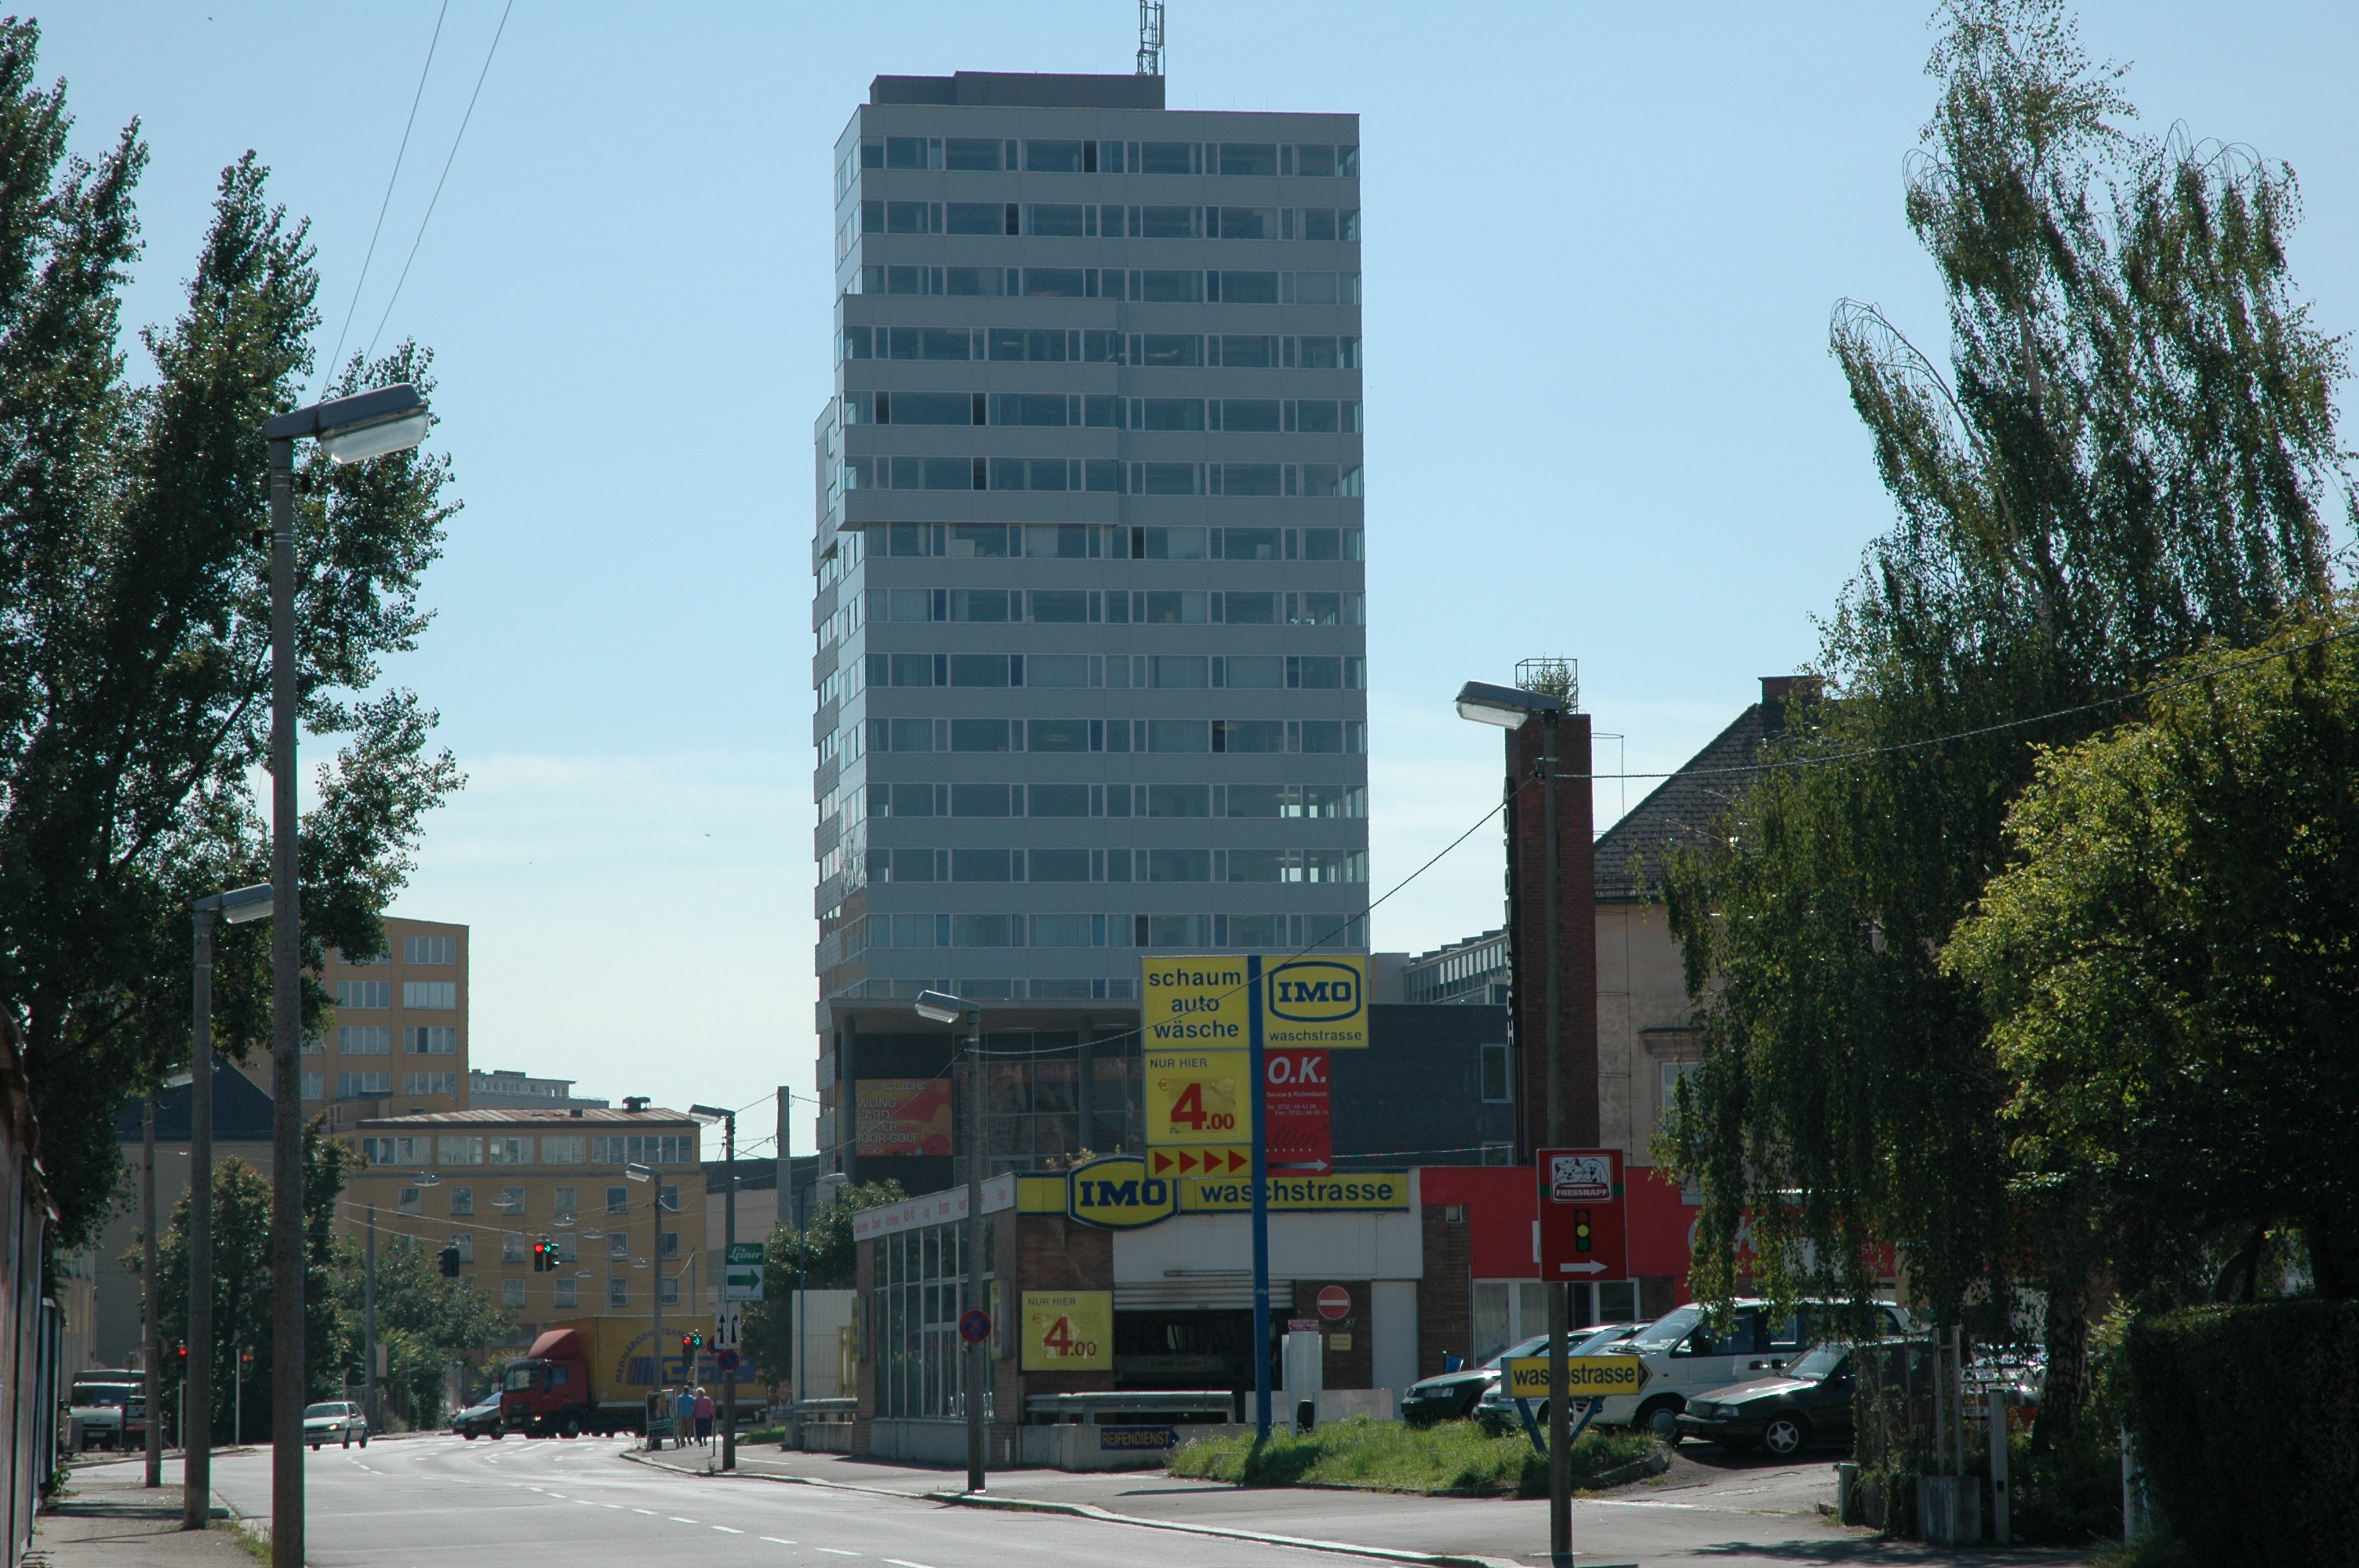 City Hotel Linz Parken